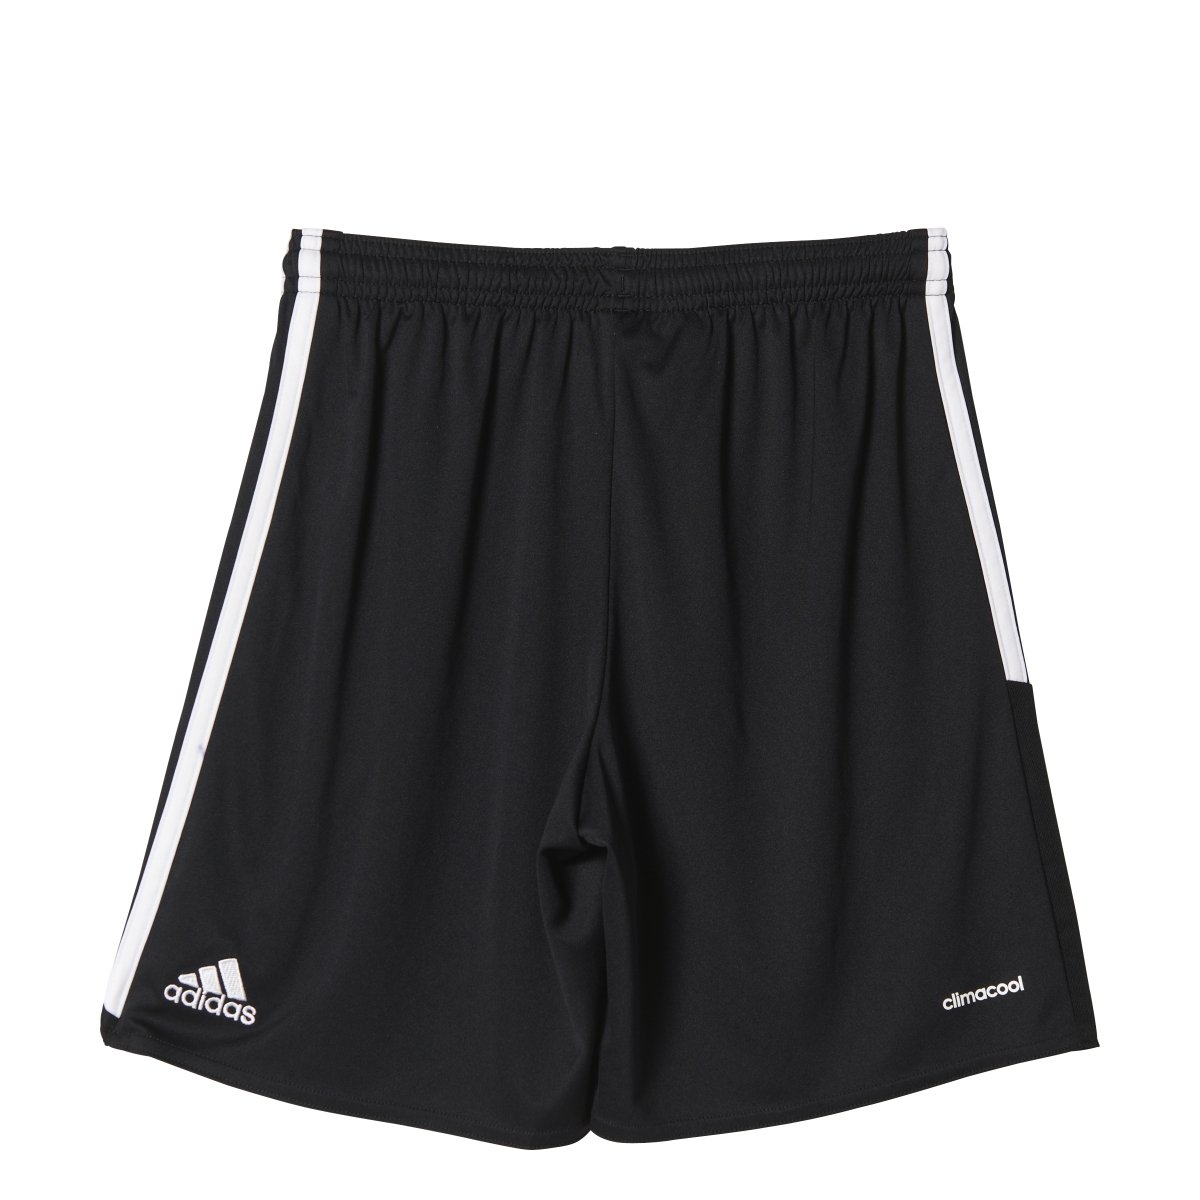 Adidas Youth Regista 16 Short B01866GR1U Youth Large|ブラック-ホワイト ブラック-ホワイト Youth Large